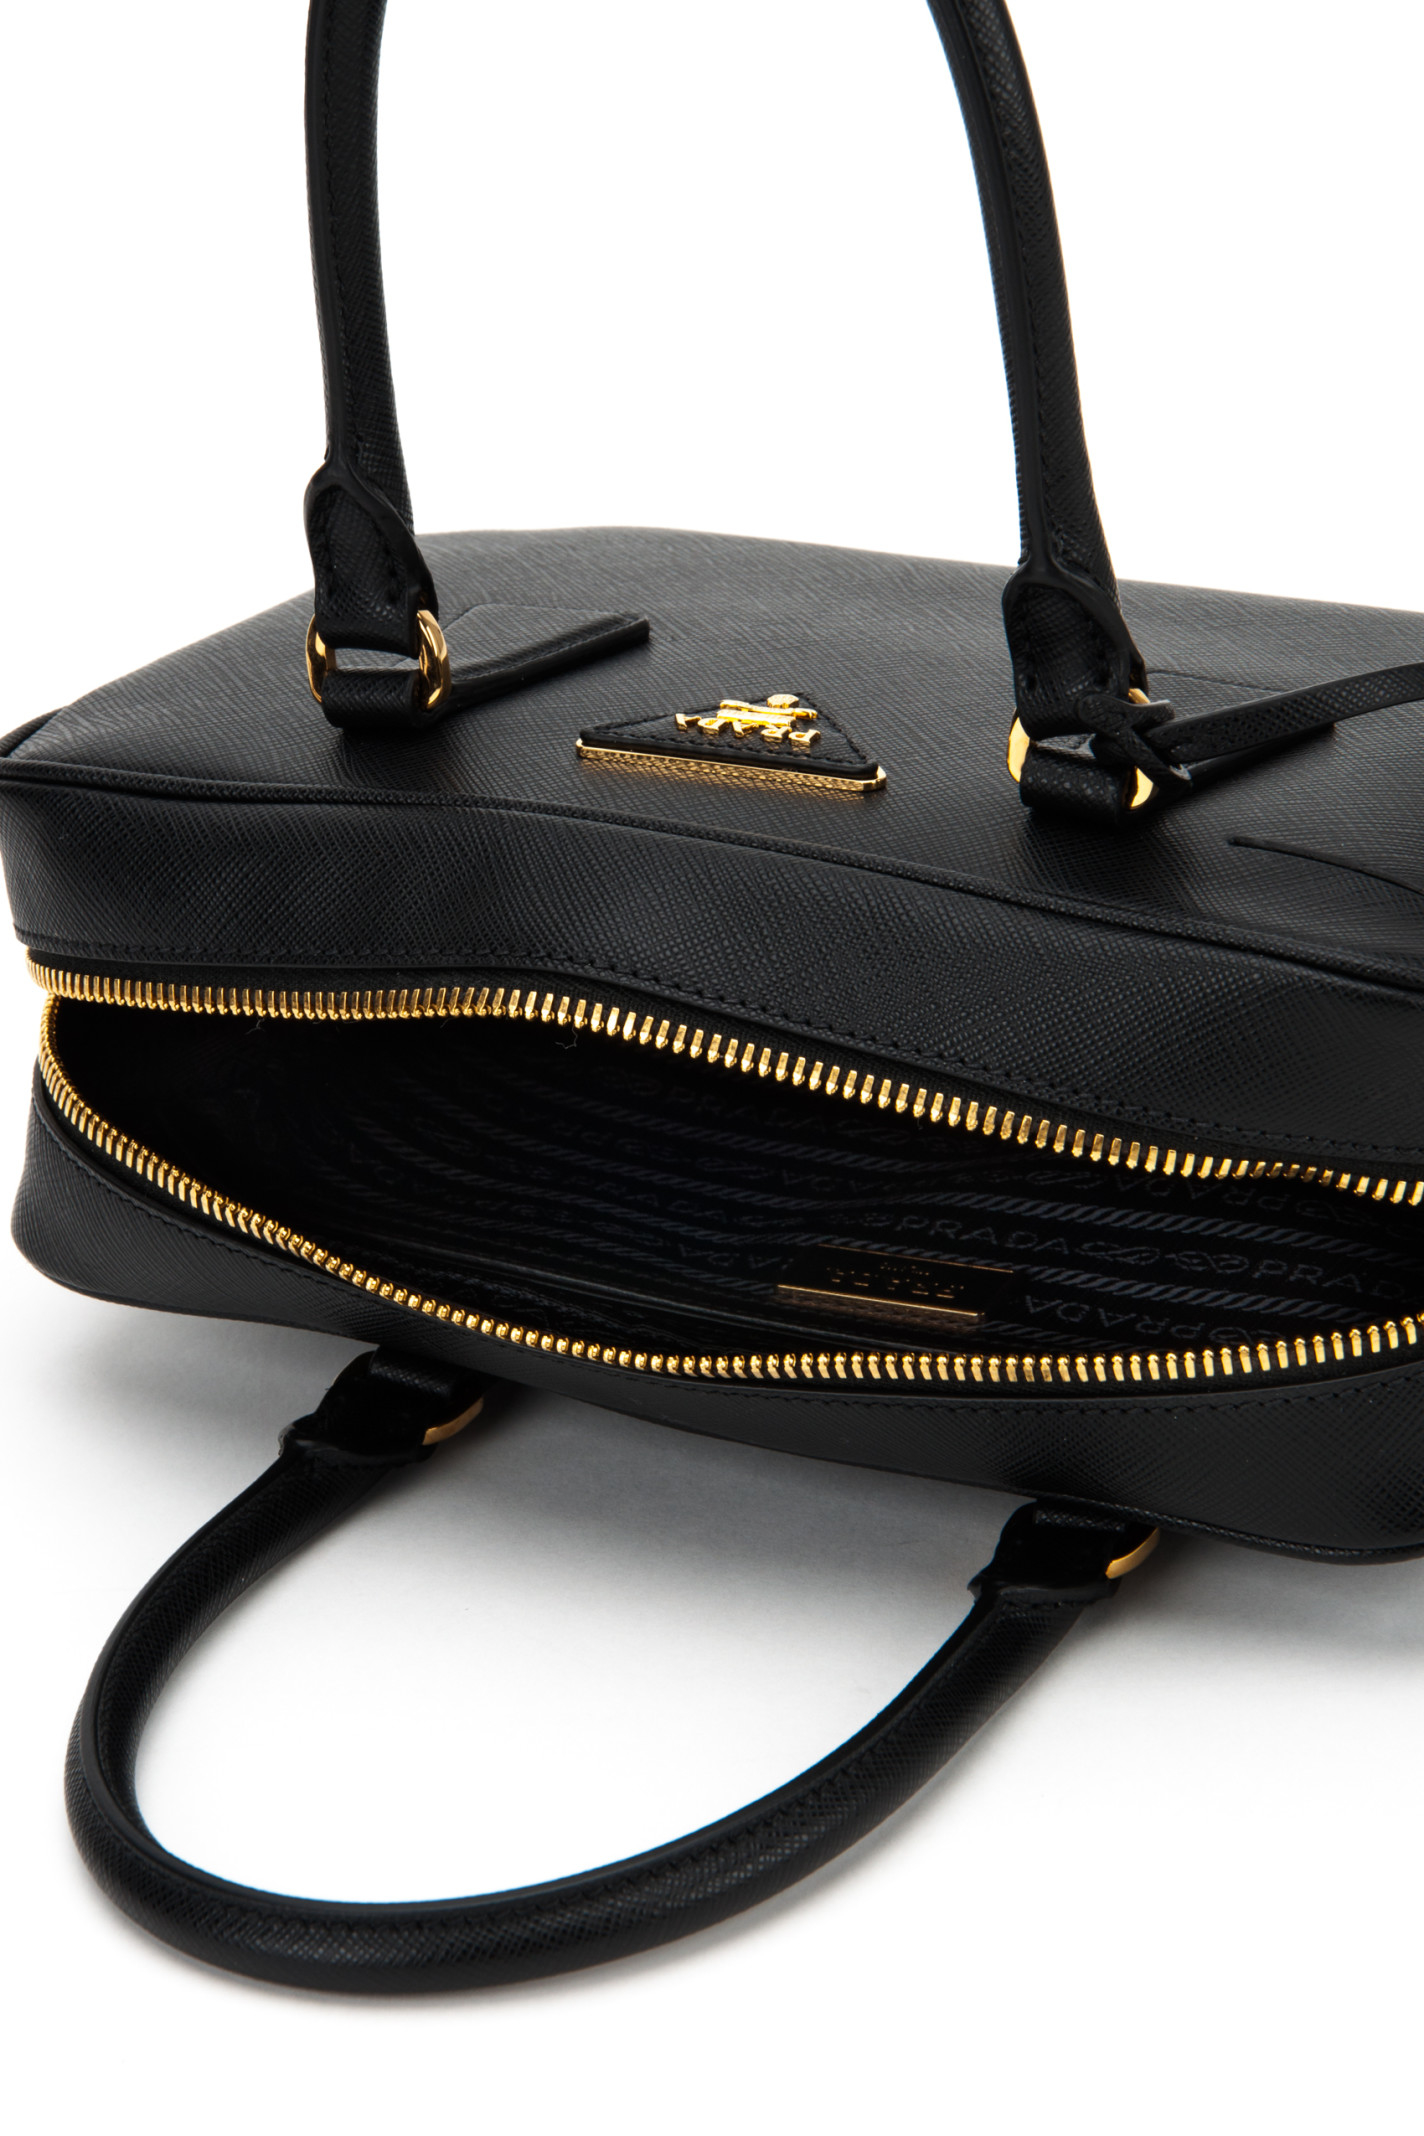 eebc32320dce cheapest prada totes 0808 light green b4e0e 78f8f  best price prada baltic  nero handbag b84ac 73c34